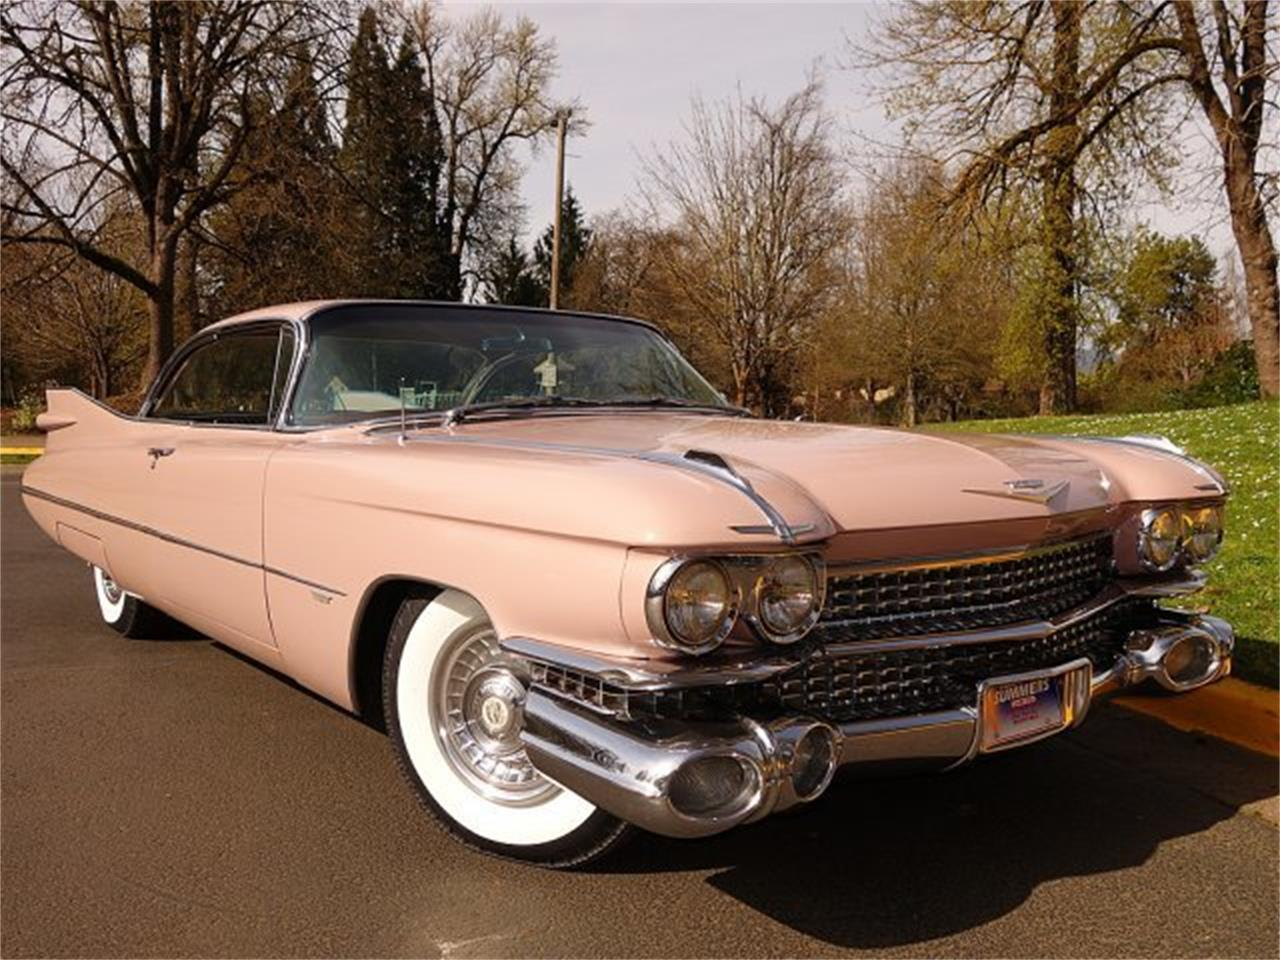 1959 Cadillac Series 62 For Sale Classiccars Com Cc 1082326